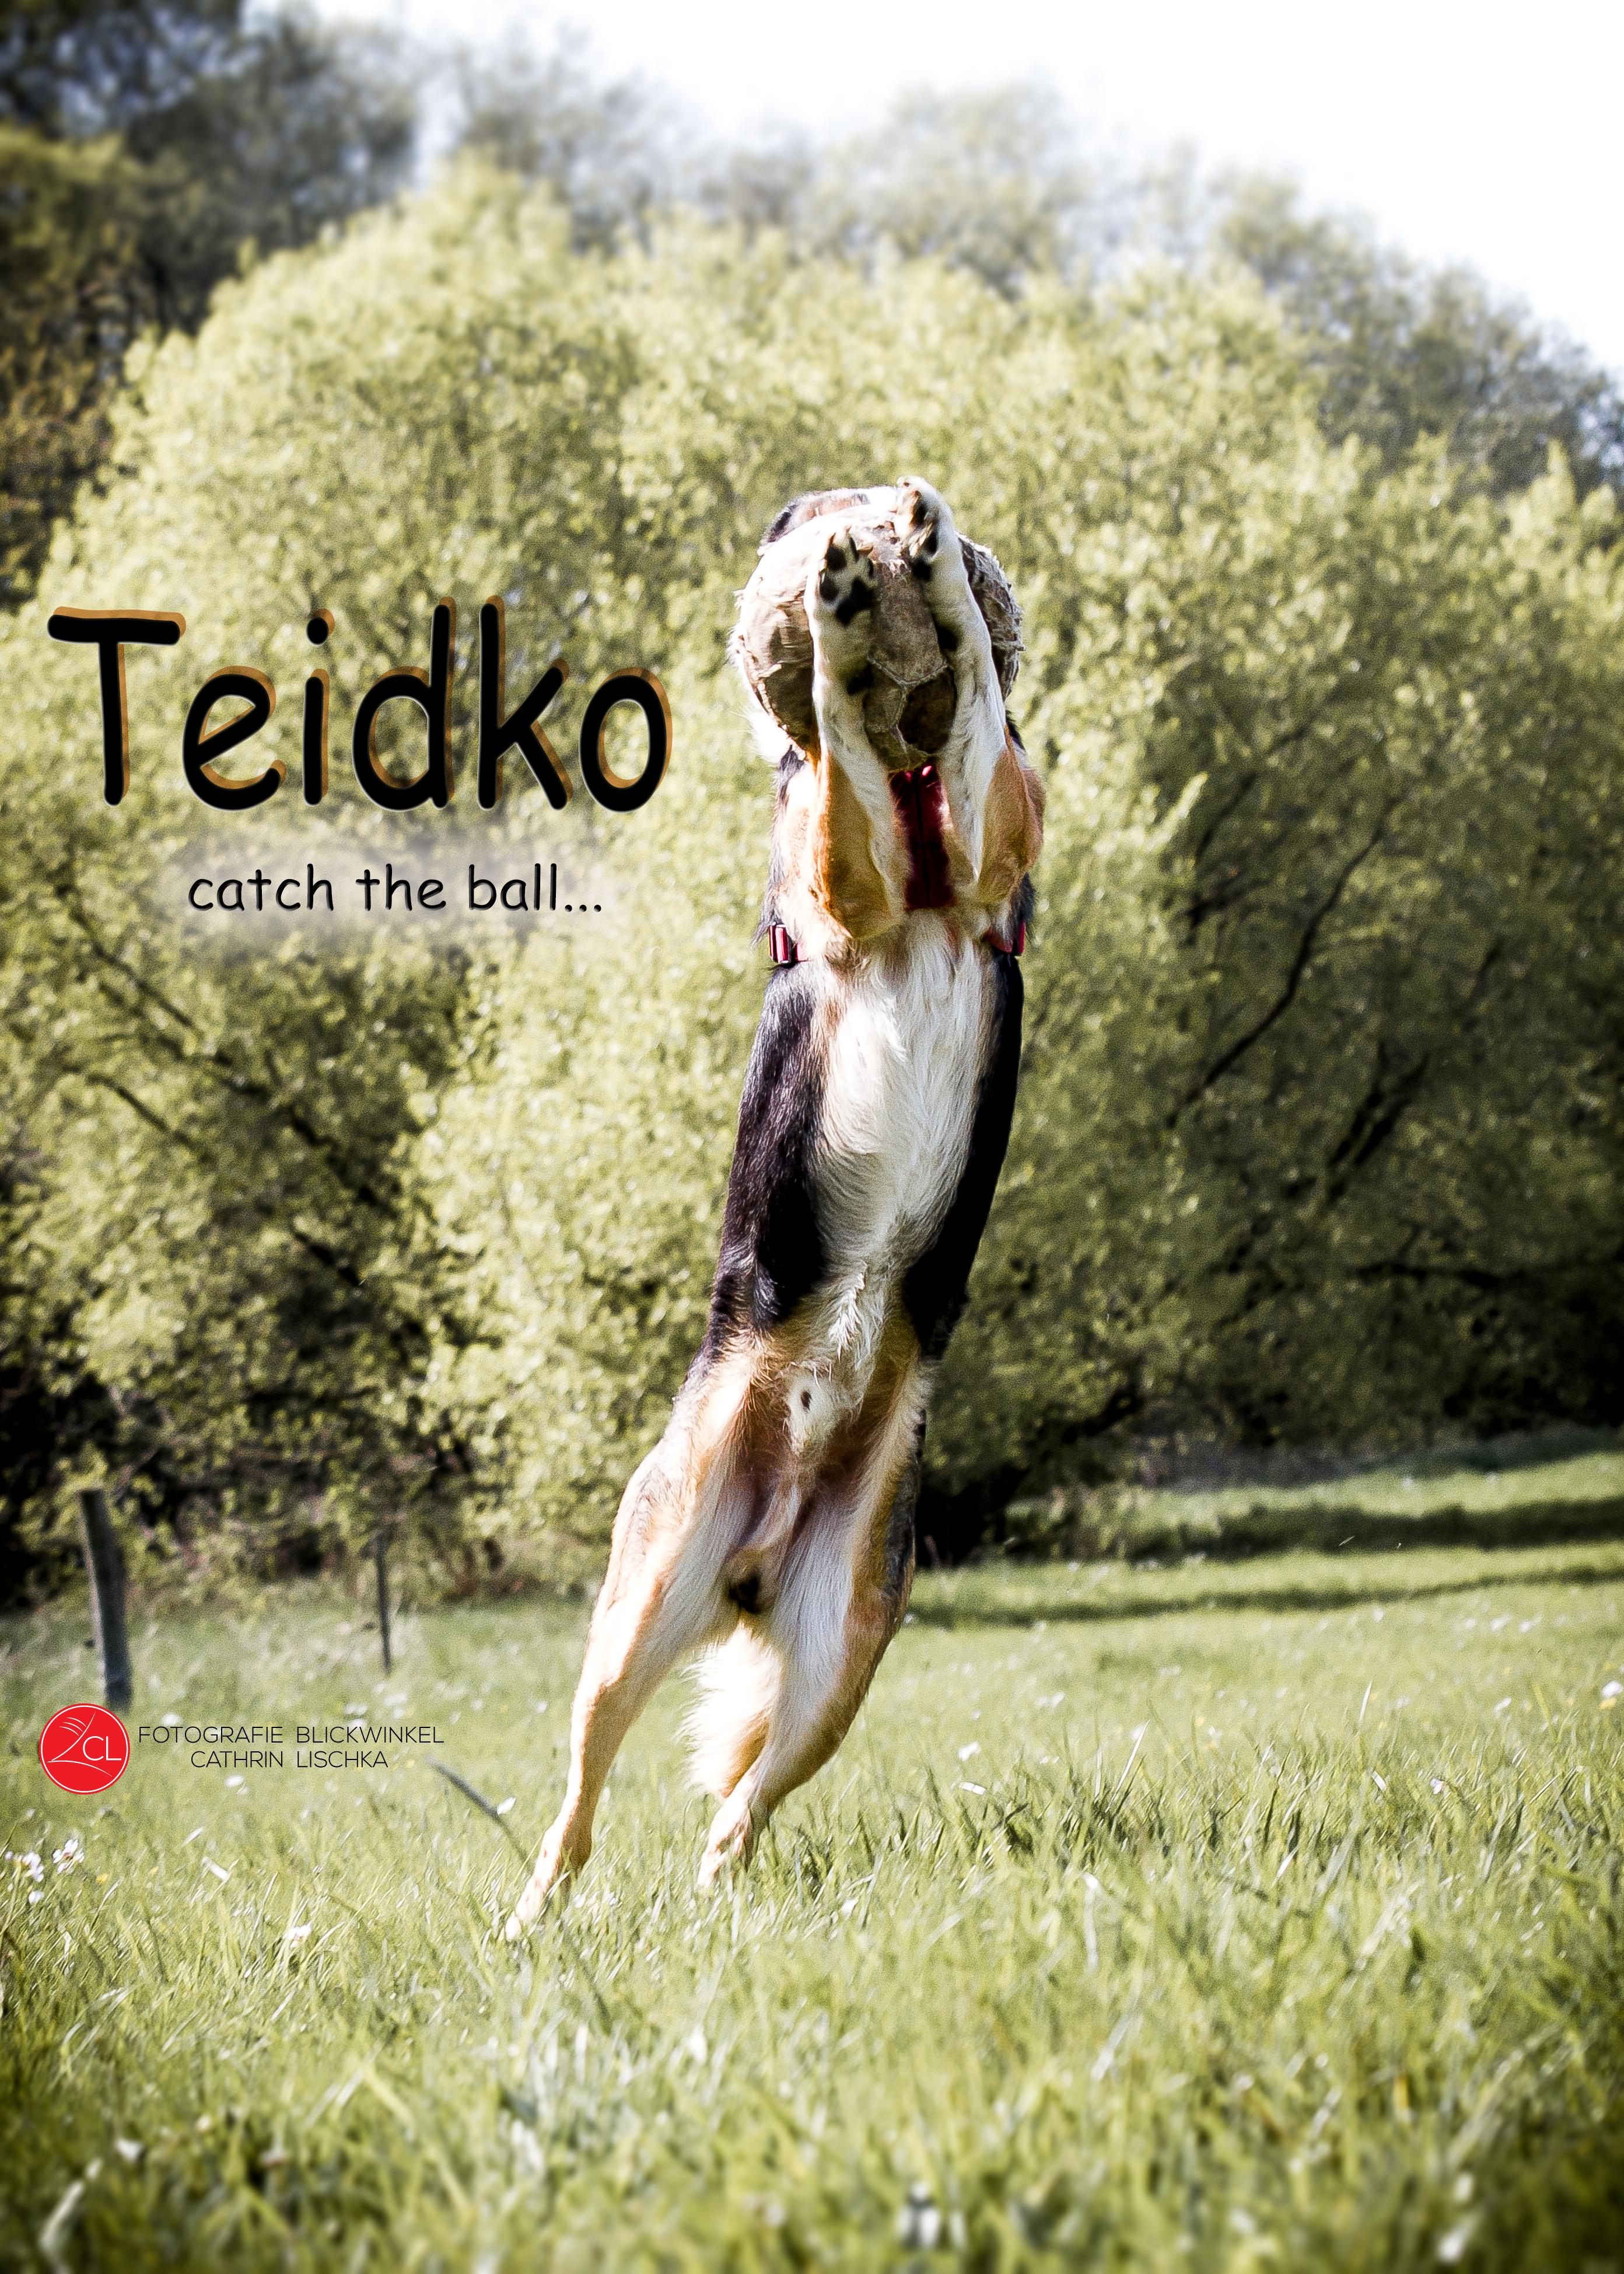 IMG_9625#fotografieblickwinkel_#fotografie_#2017_#Hütehund_#Teidko_#Hundeshooting_#BorderCollie_#Hun